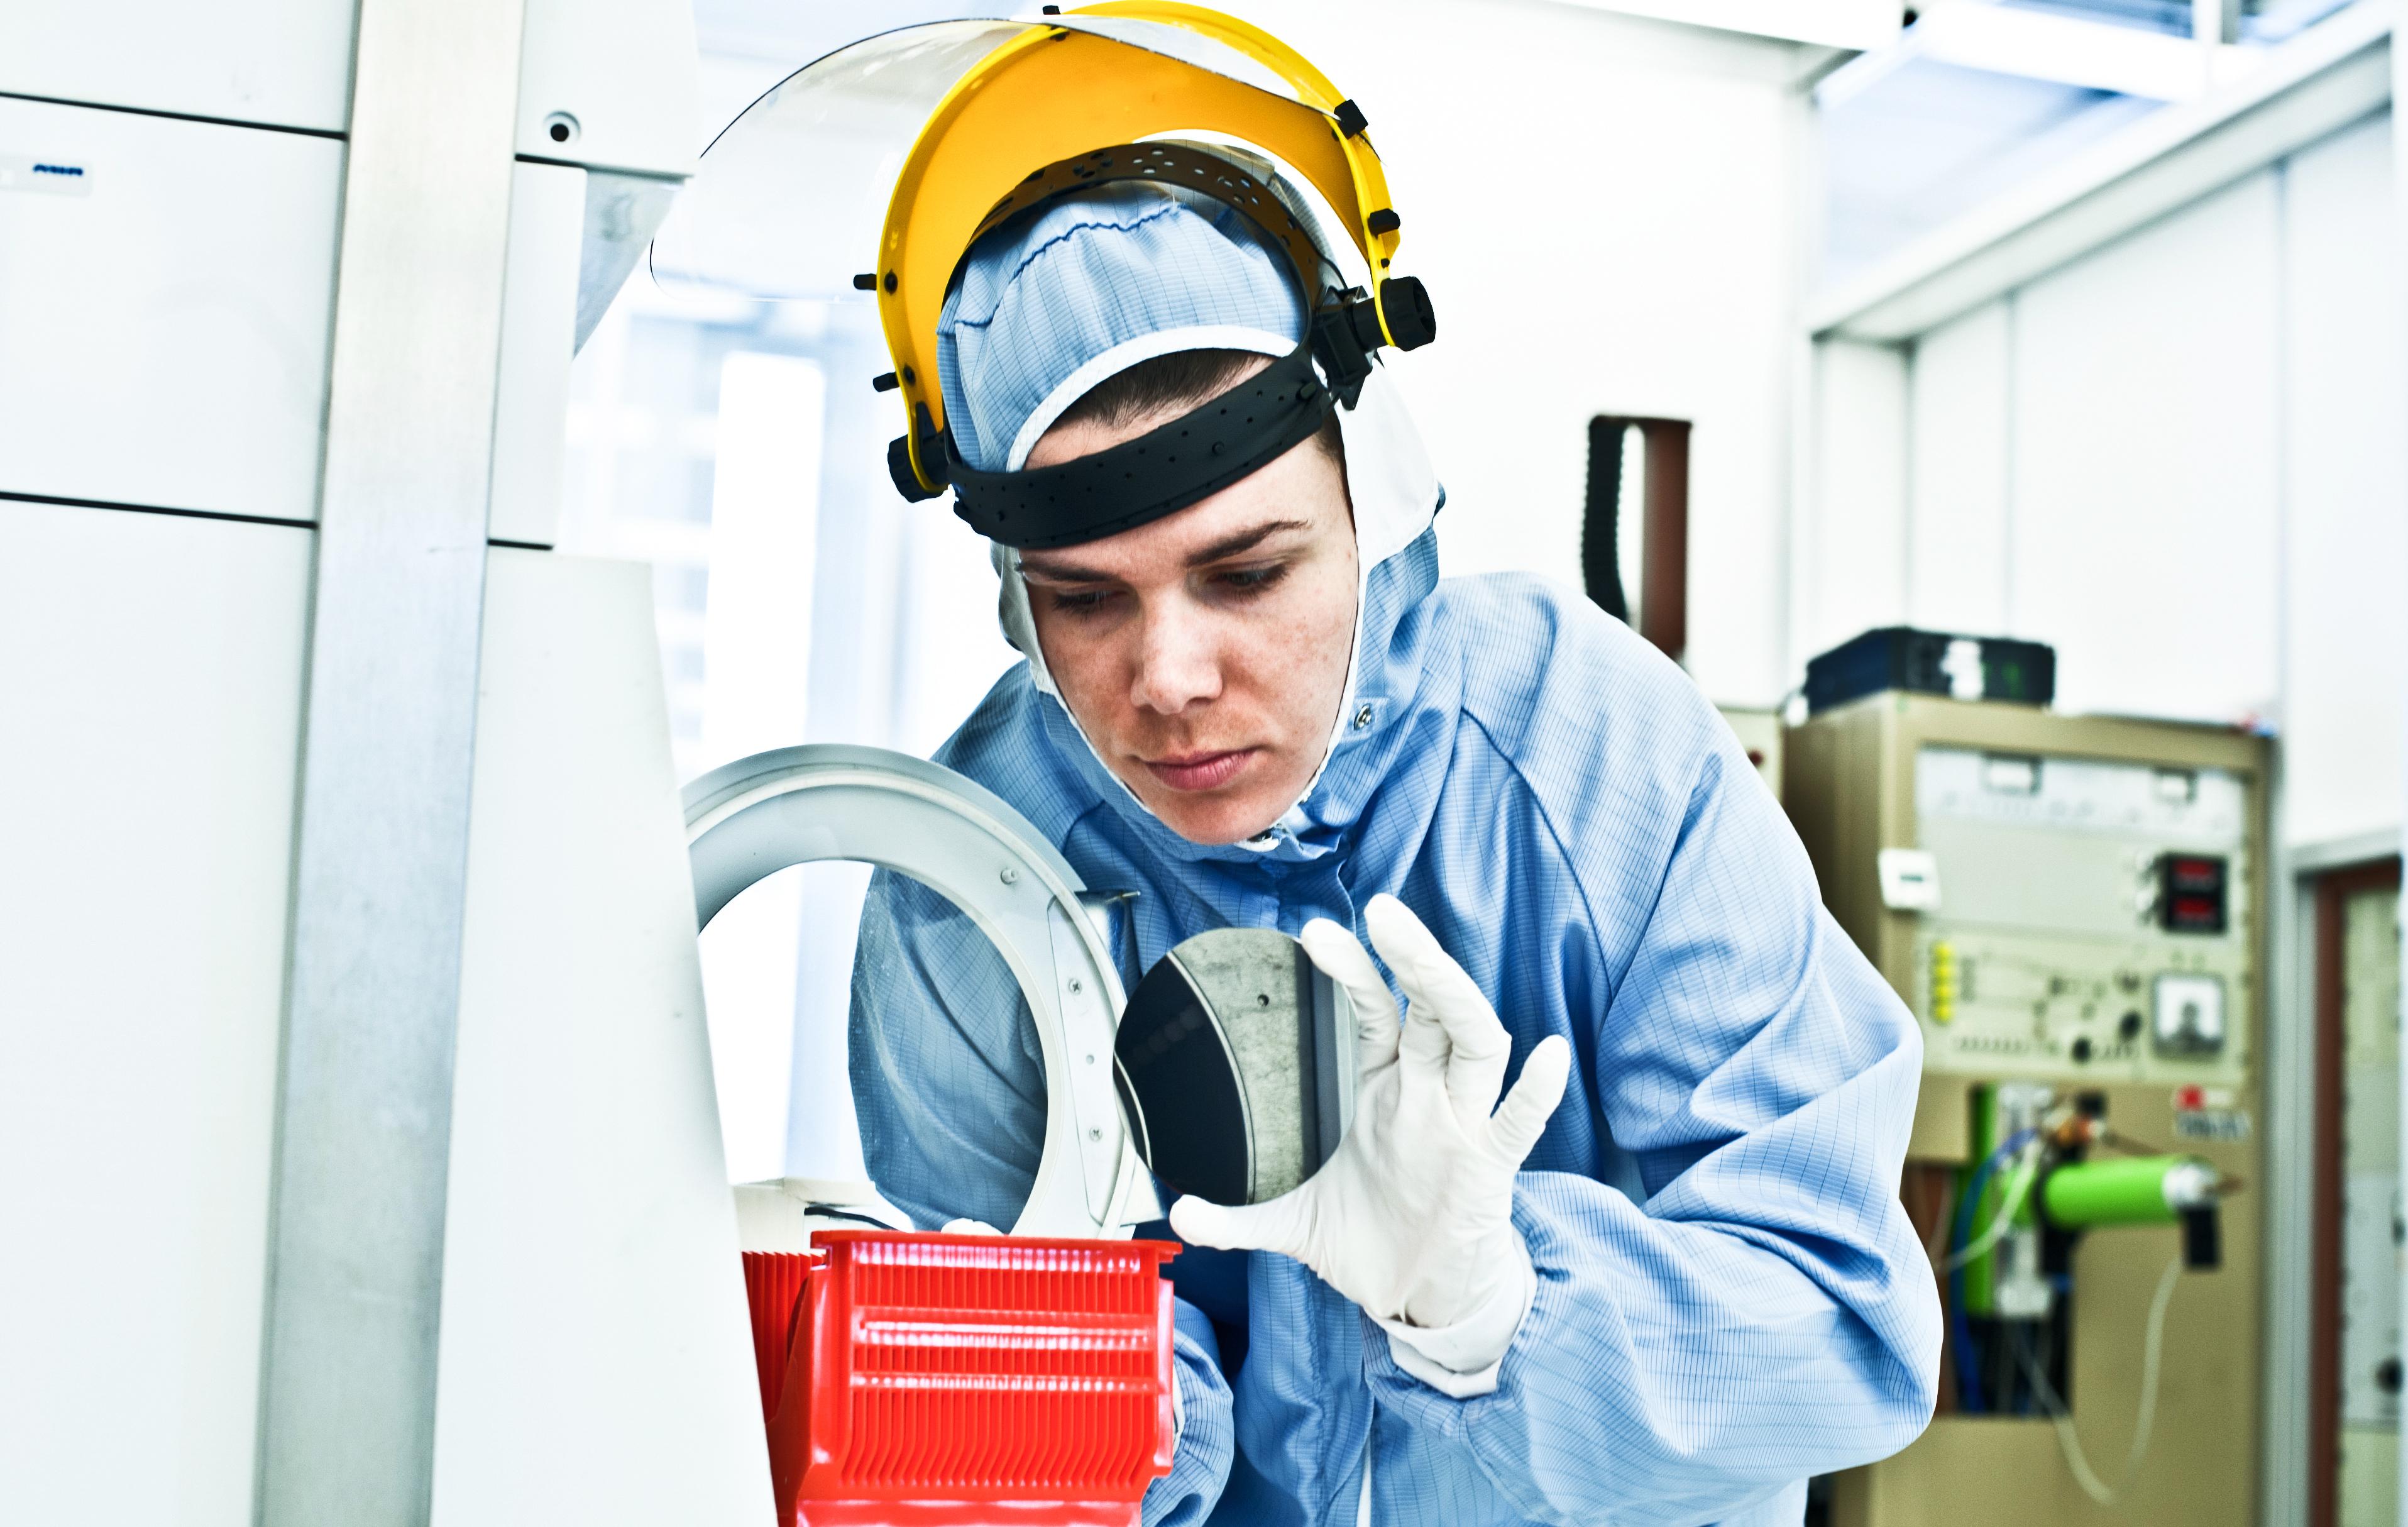 Worker handling semicondutor wafer